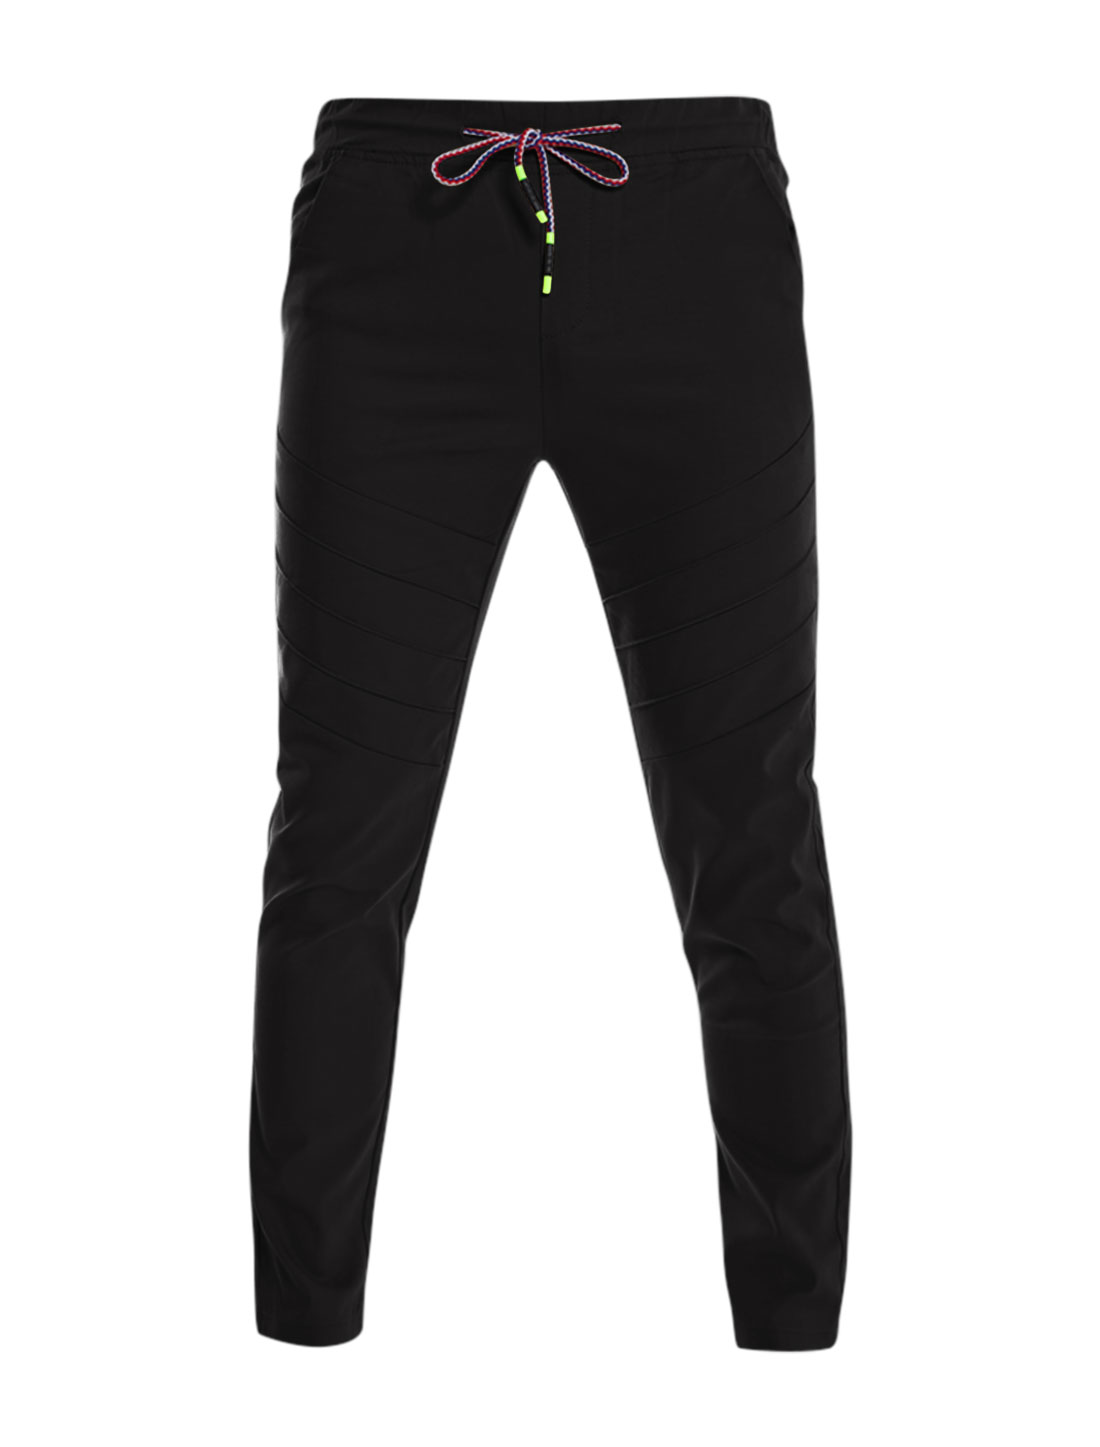 Men Drawstring Elastic Waist Slant Pocket Pleated Front Pants Black W30